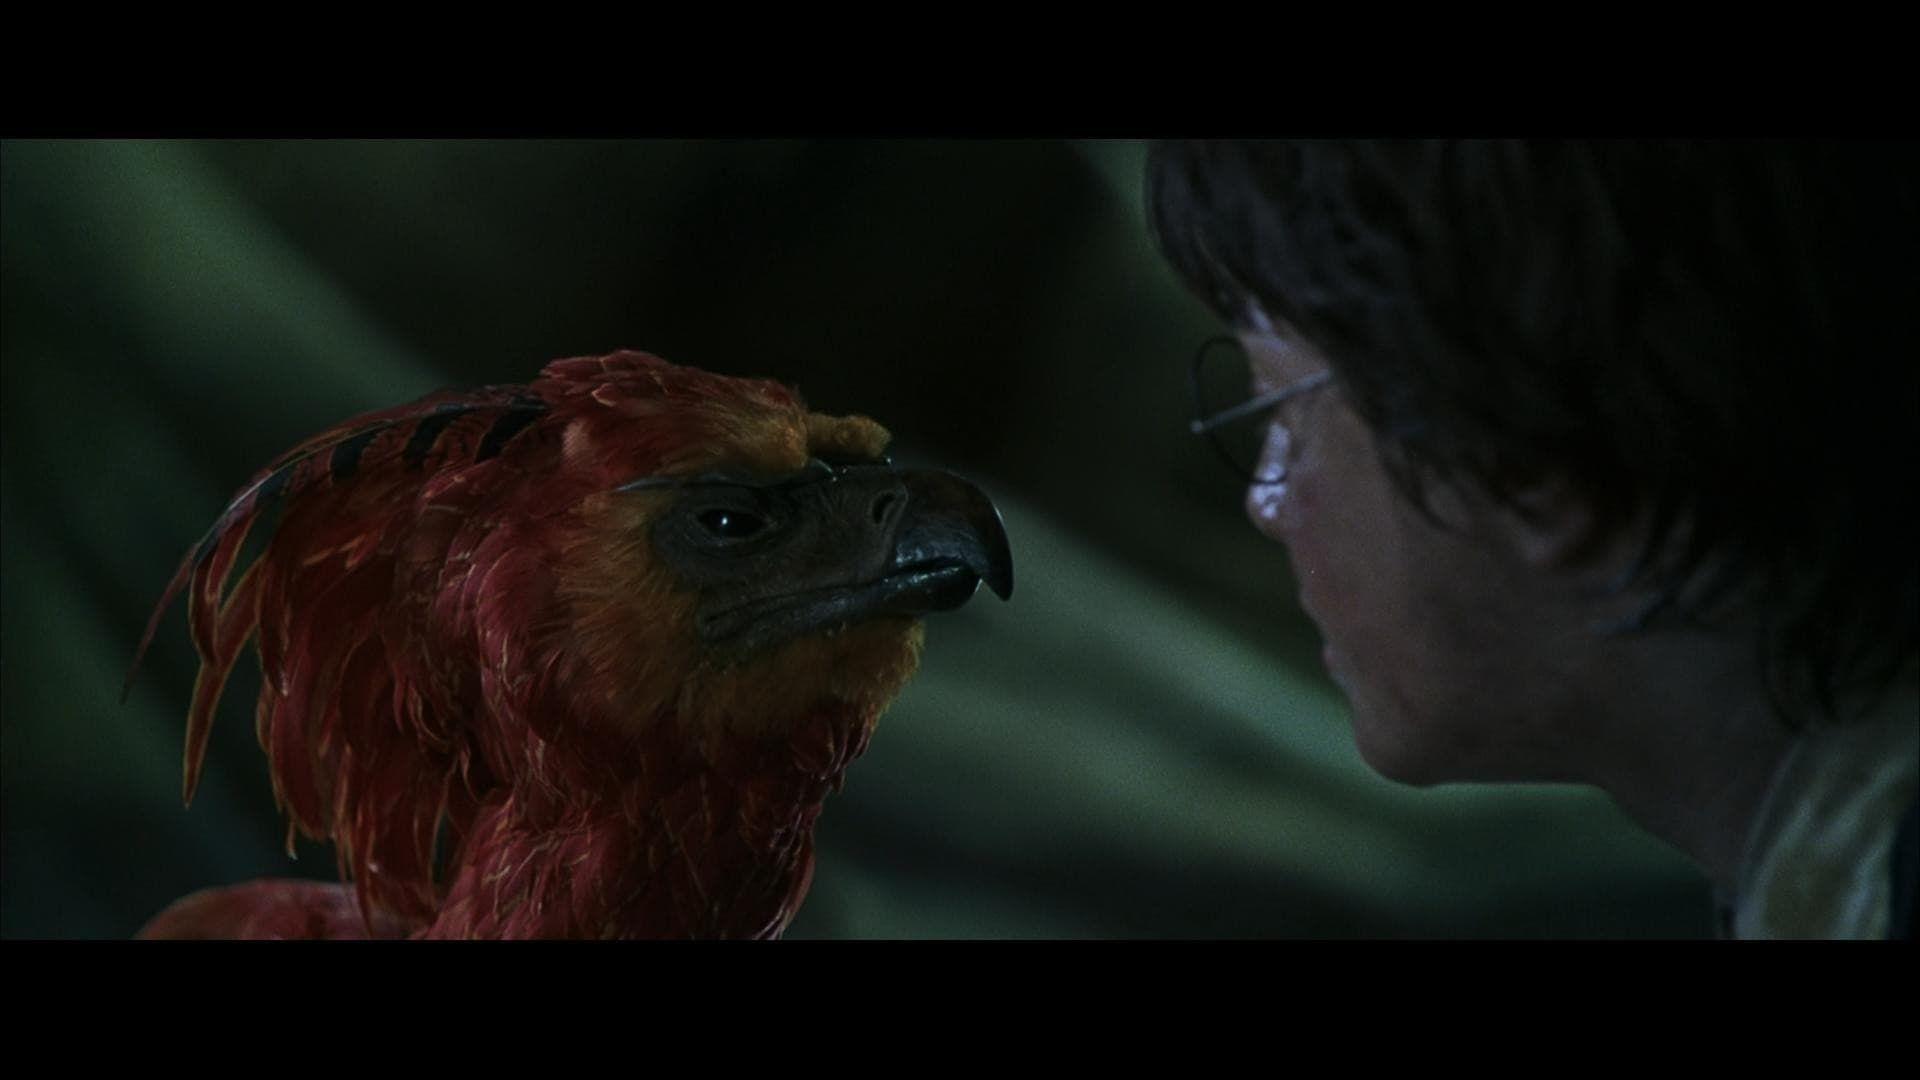 Watch Harry Potter Y La Camara Secreta 2002 Putlocker Film Complet Streaming Harry Regresa A Su S Chamber Of Secrets Free Movies Online Full Movies Online Free